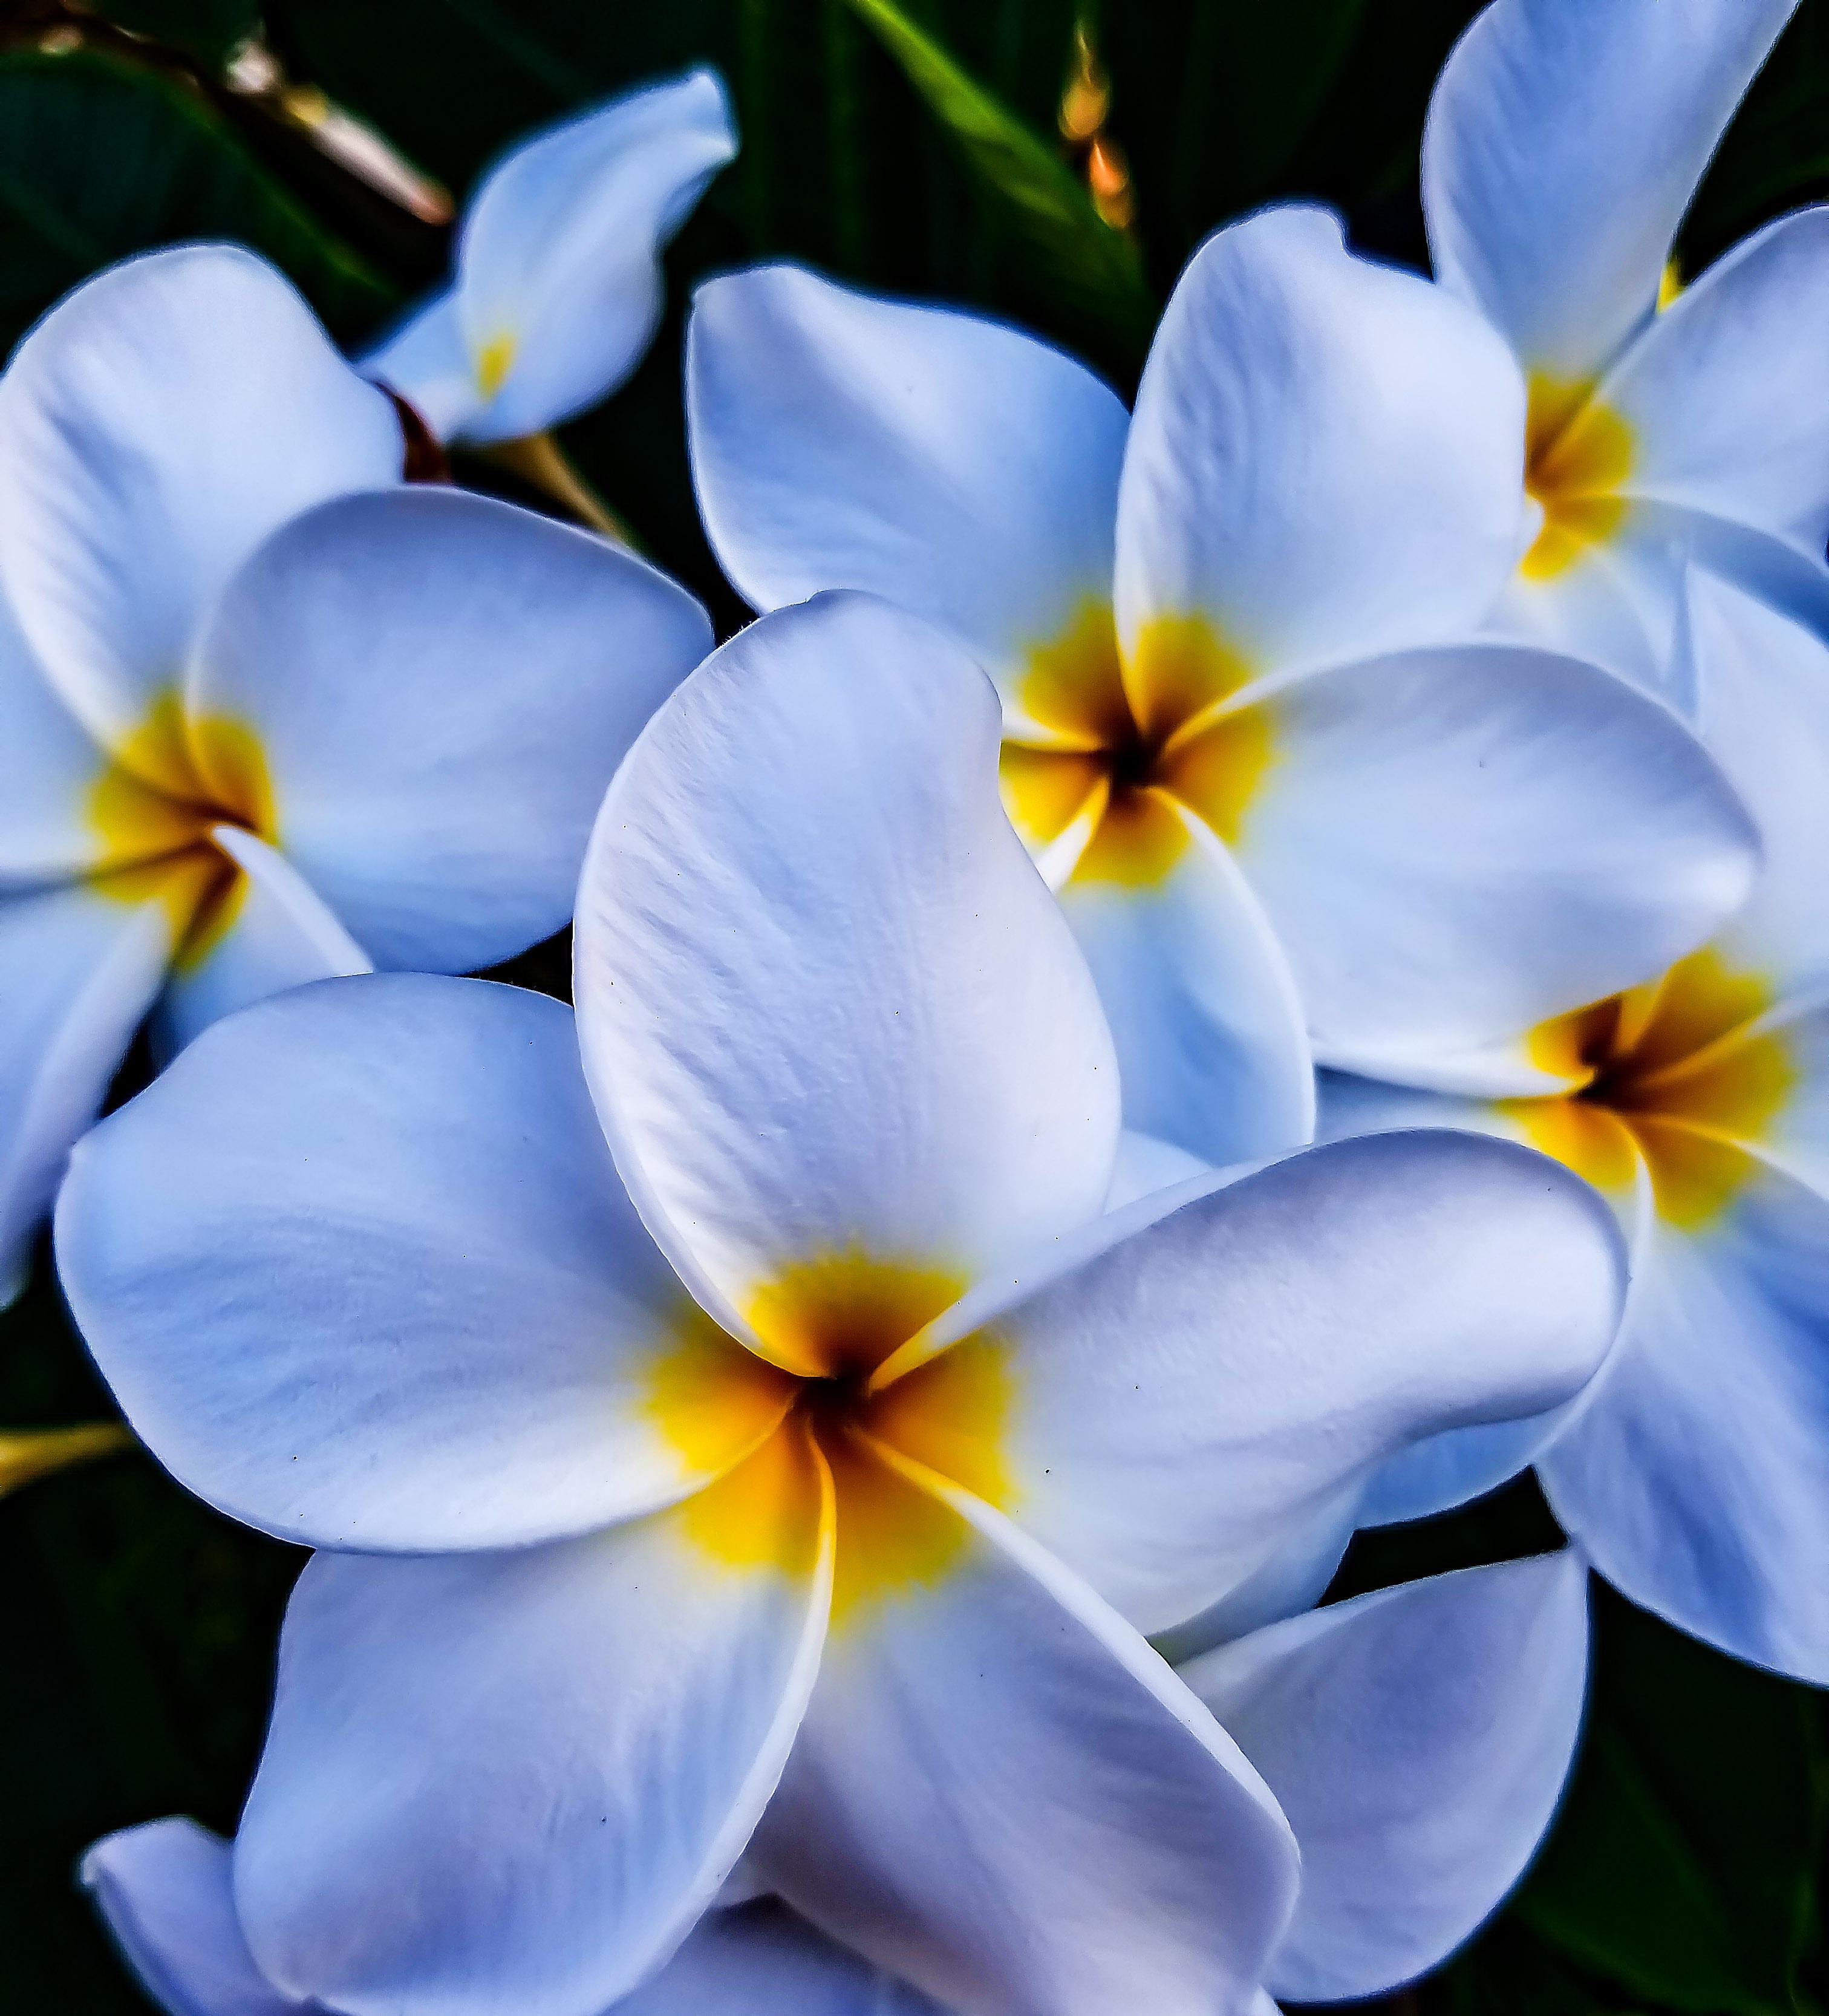 Spring Summer Flowers Torsadventures